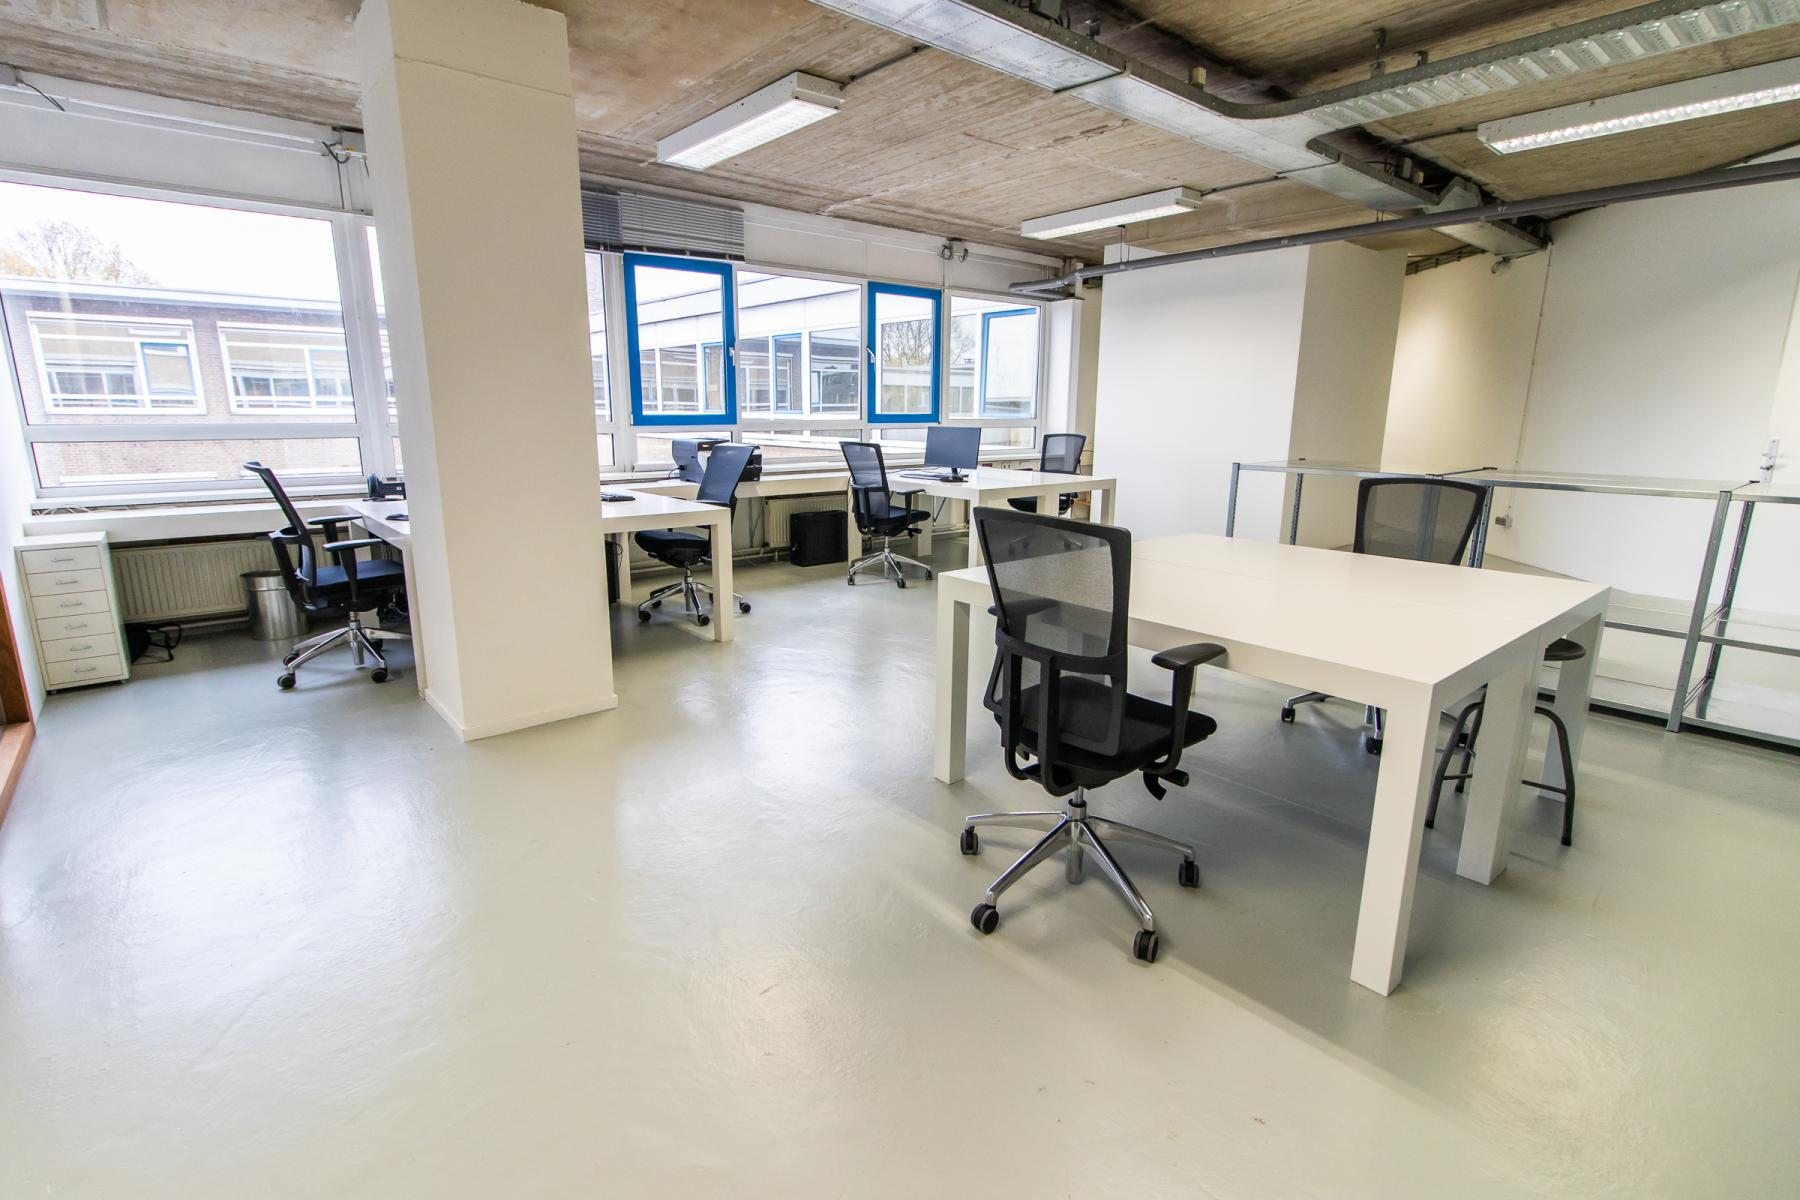 Rent office space Nieuwpoortkade 2a, Amsterdam (13)